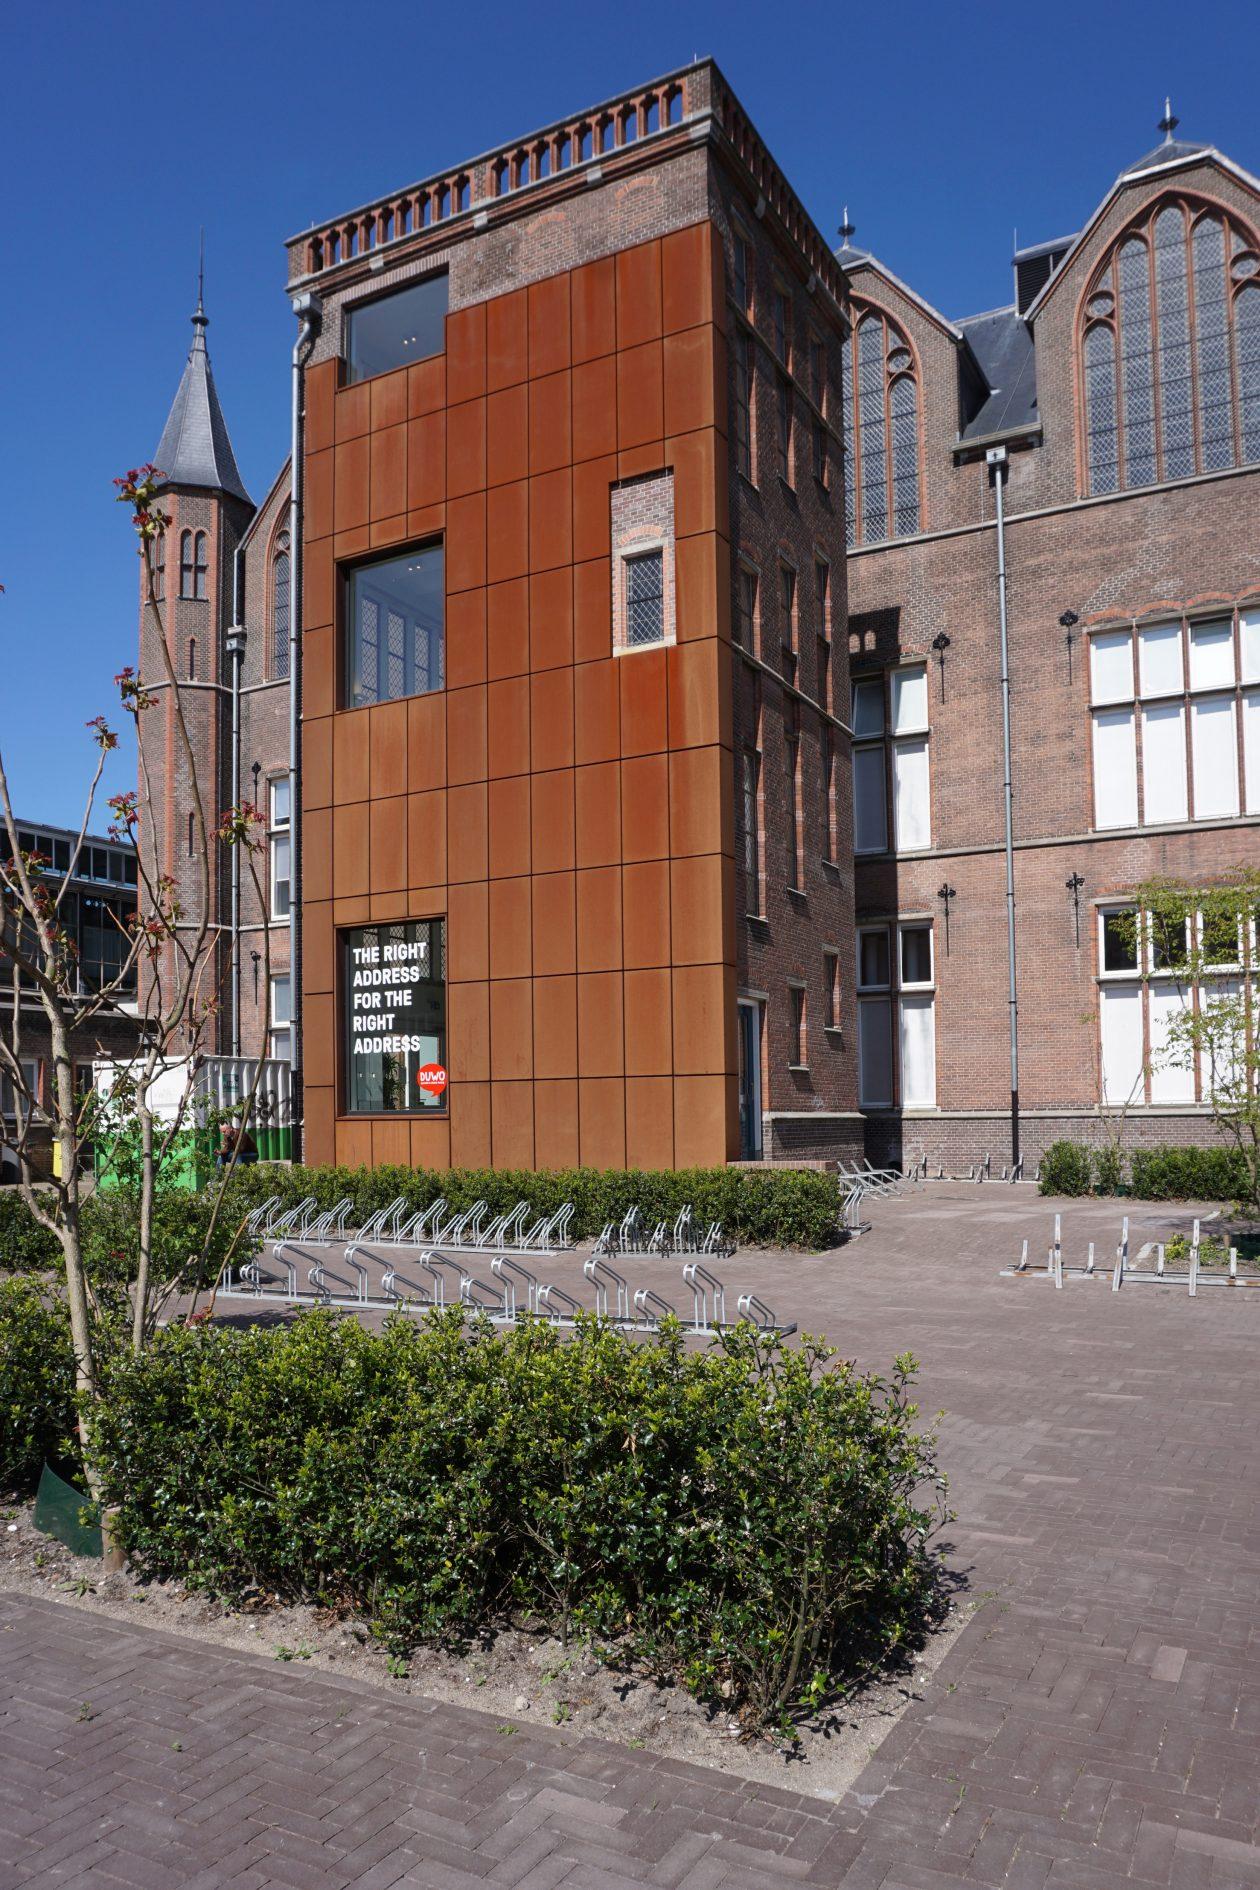 kantoor duwo en phd house delft, dp6 - architectuur.nl